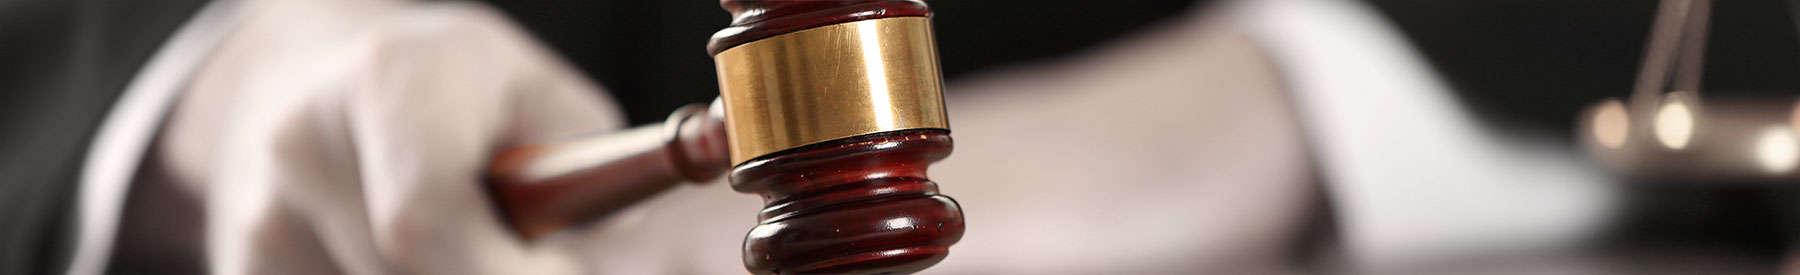 CHM Law Case Victories & Successful Clients